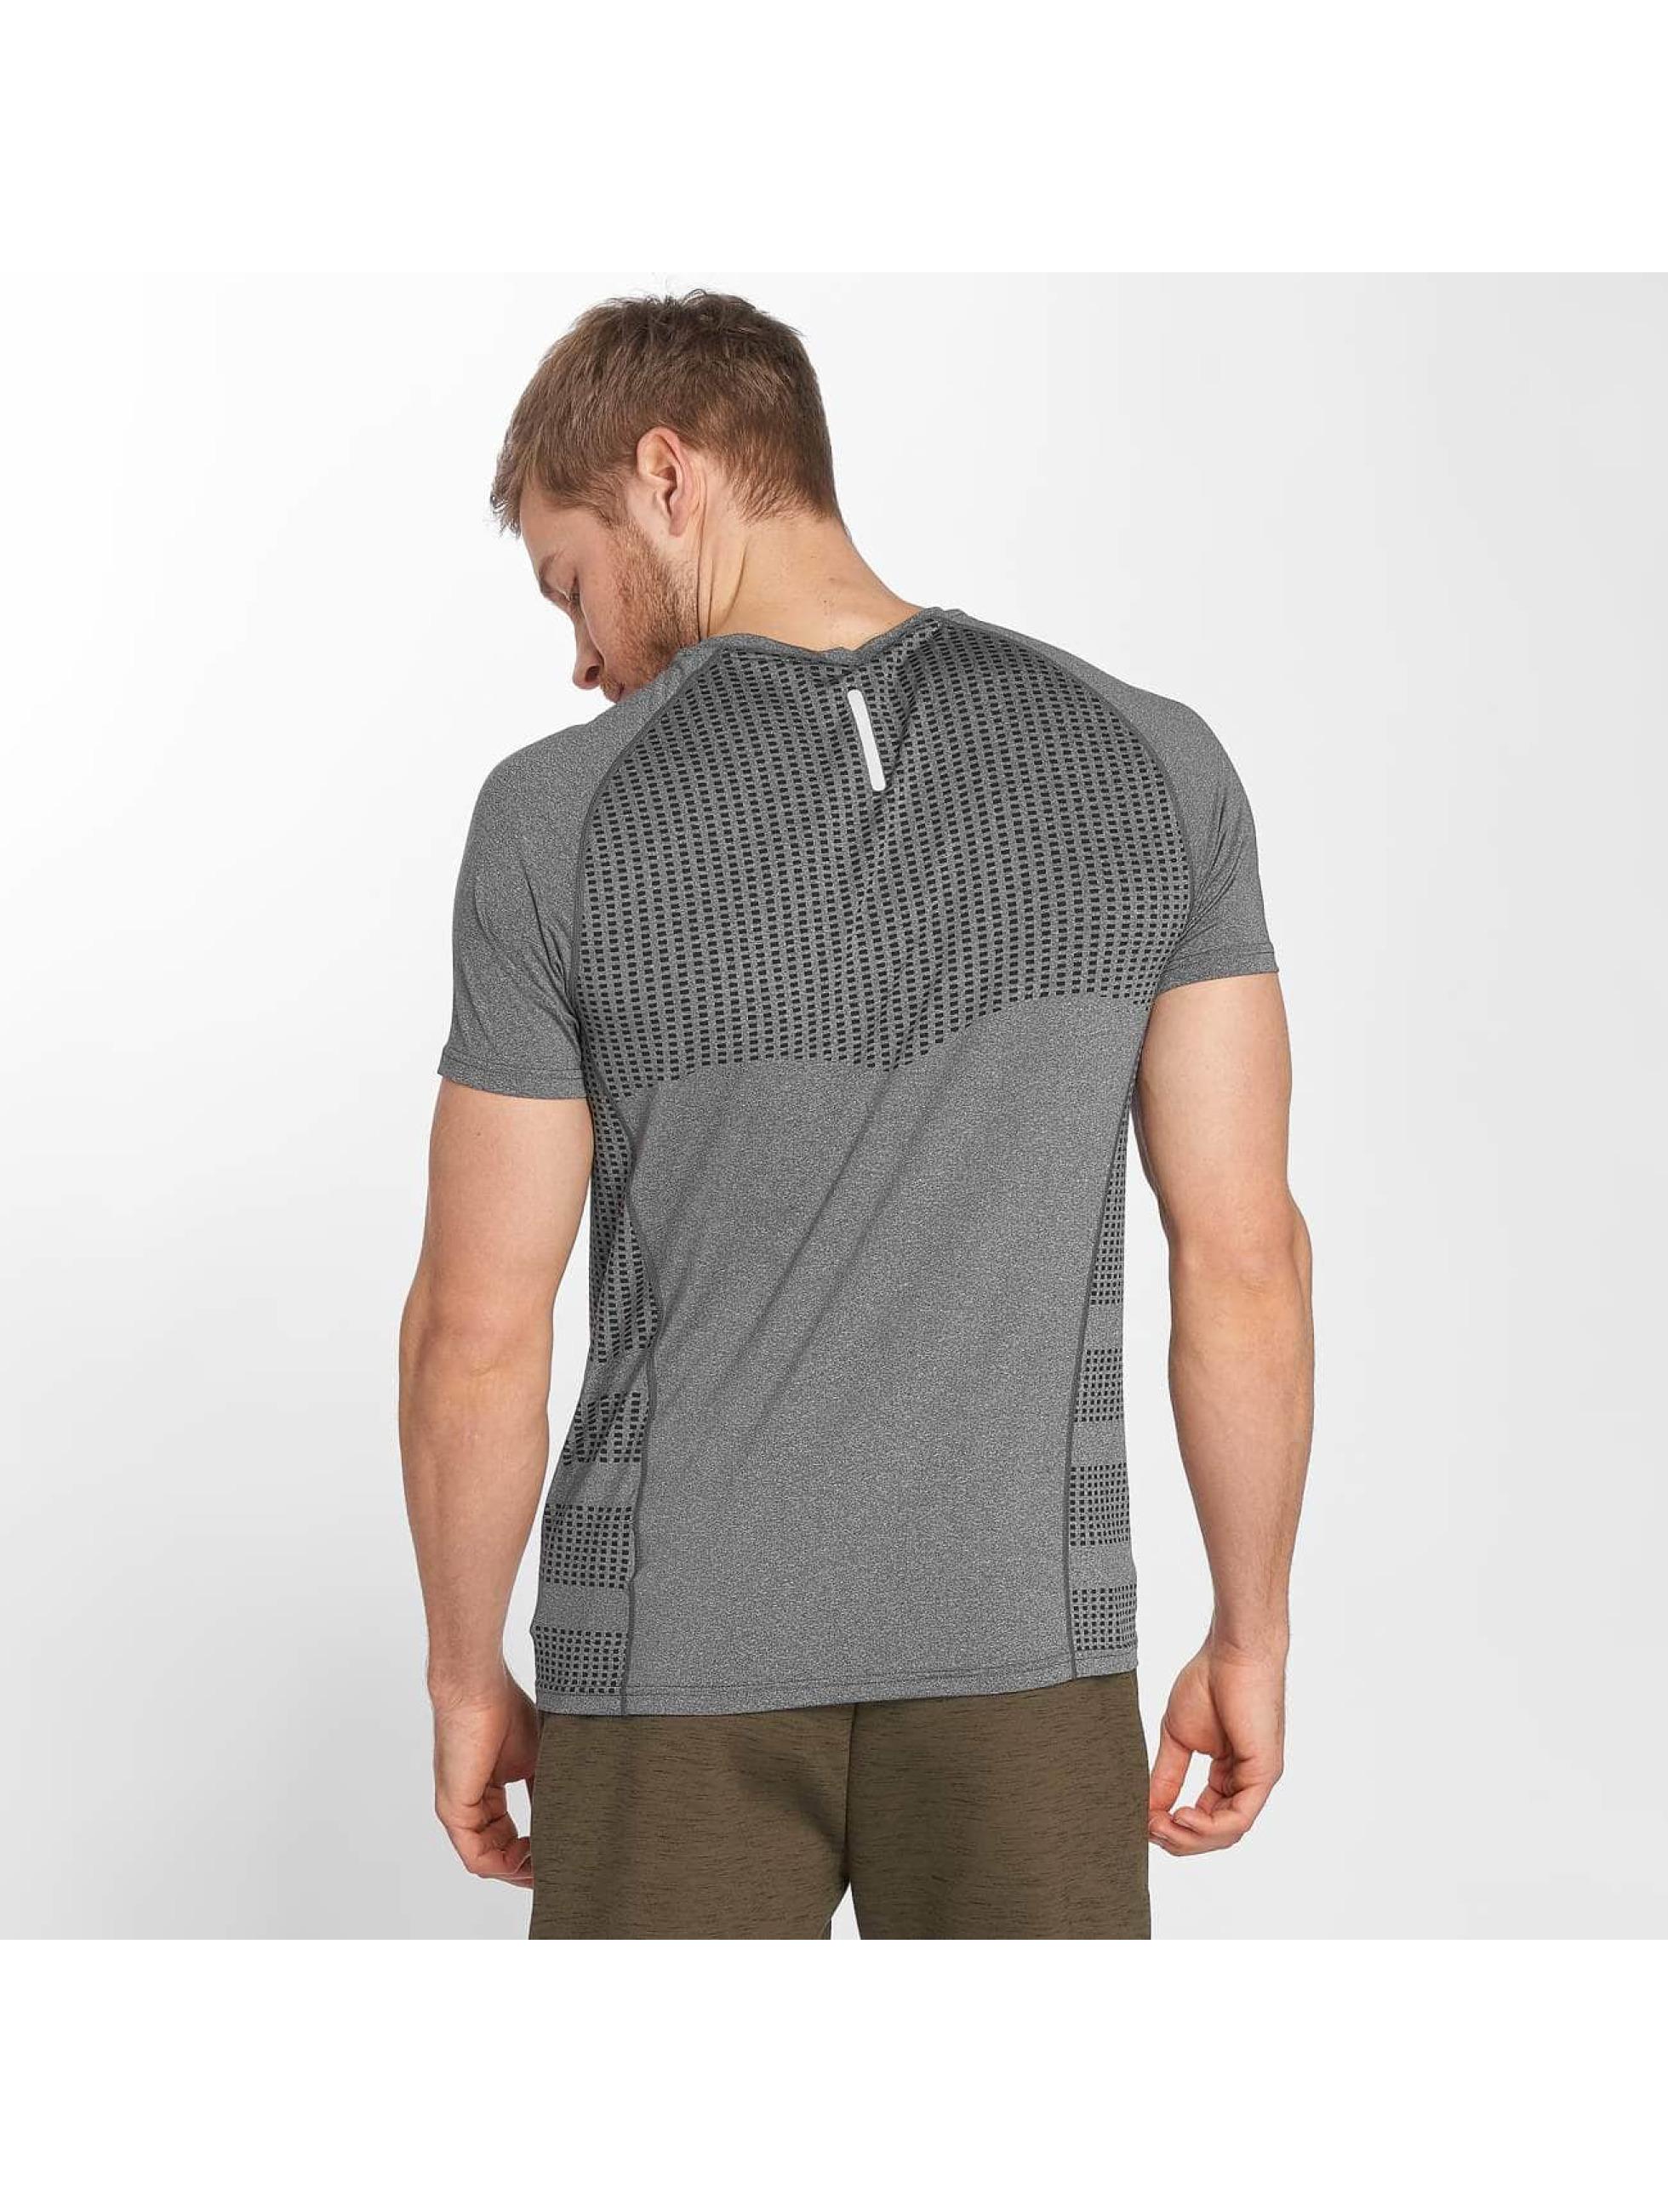 GymCodes T-Shirt Performance grau